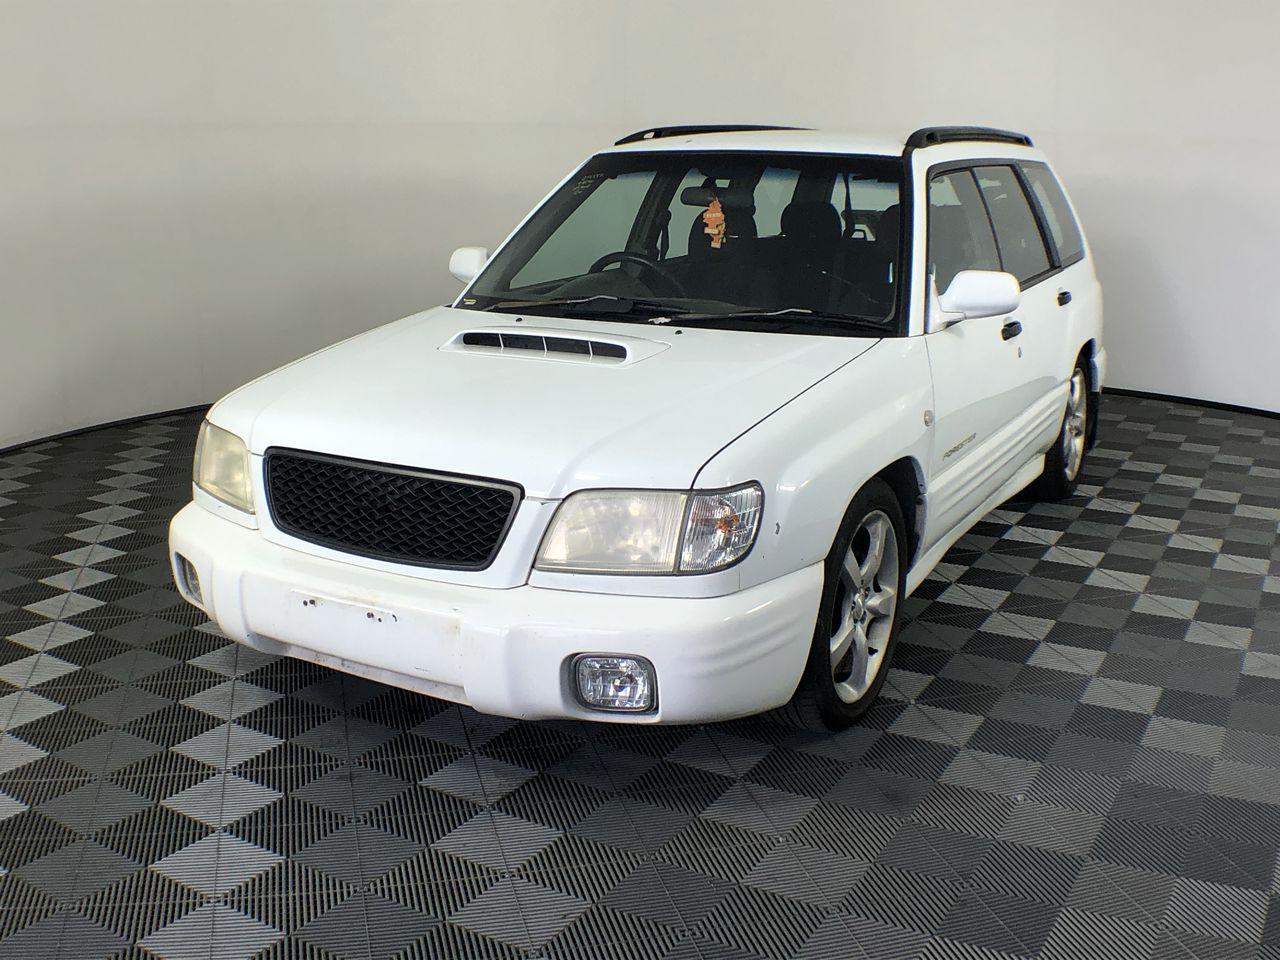 2000 Subaru Forester GT Manual Wagon